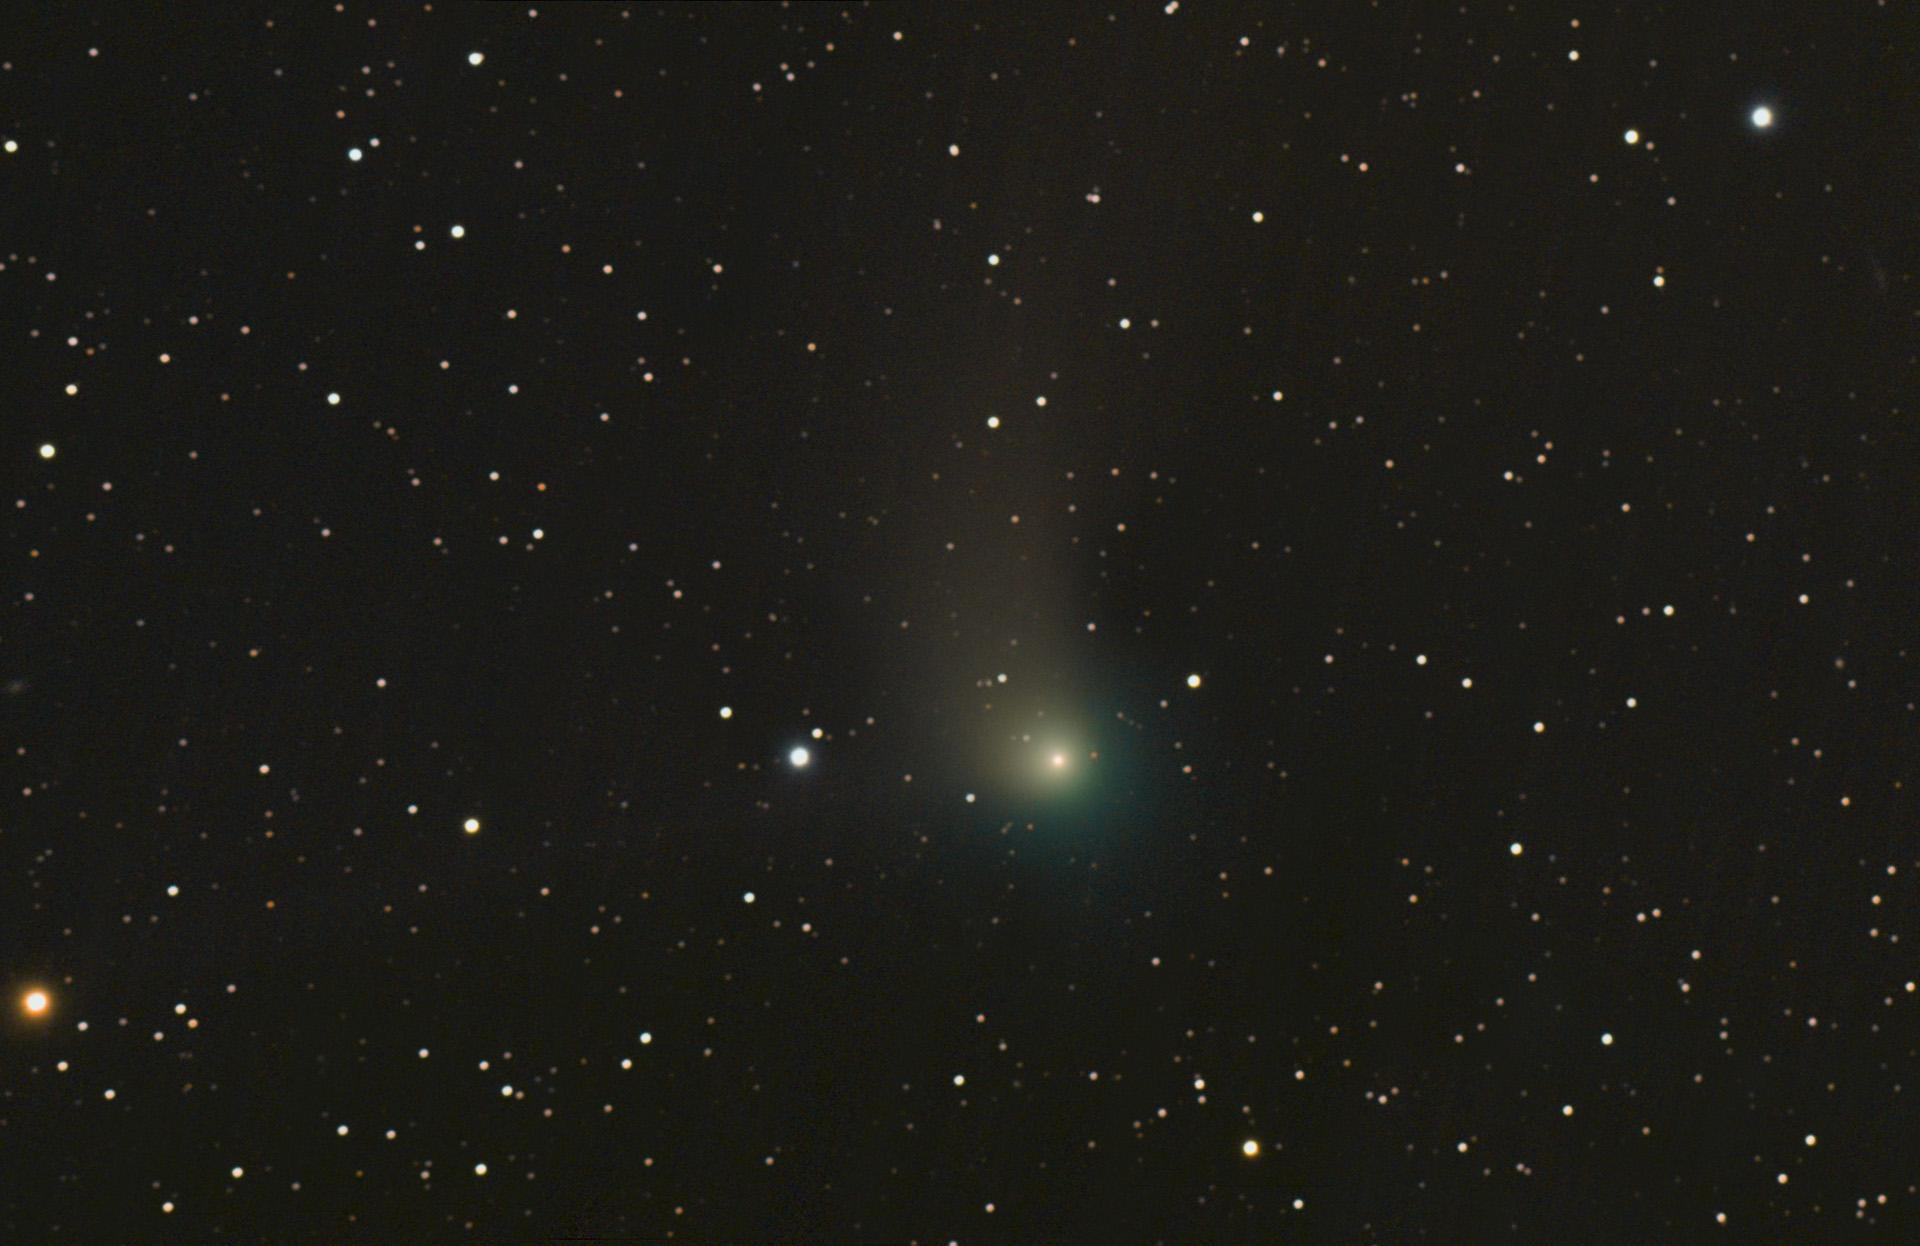 Cometa Catalina - Emili Sancha